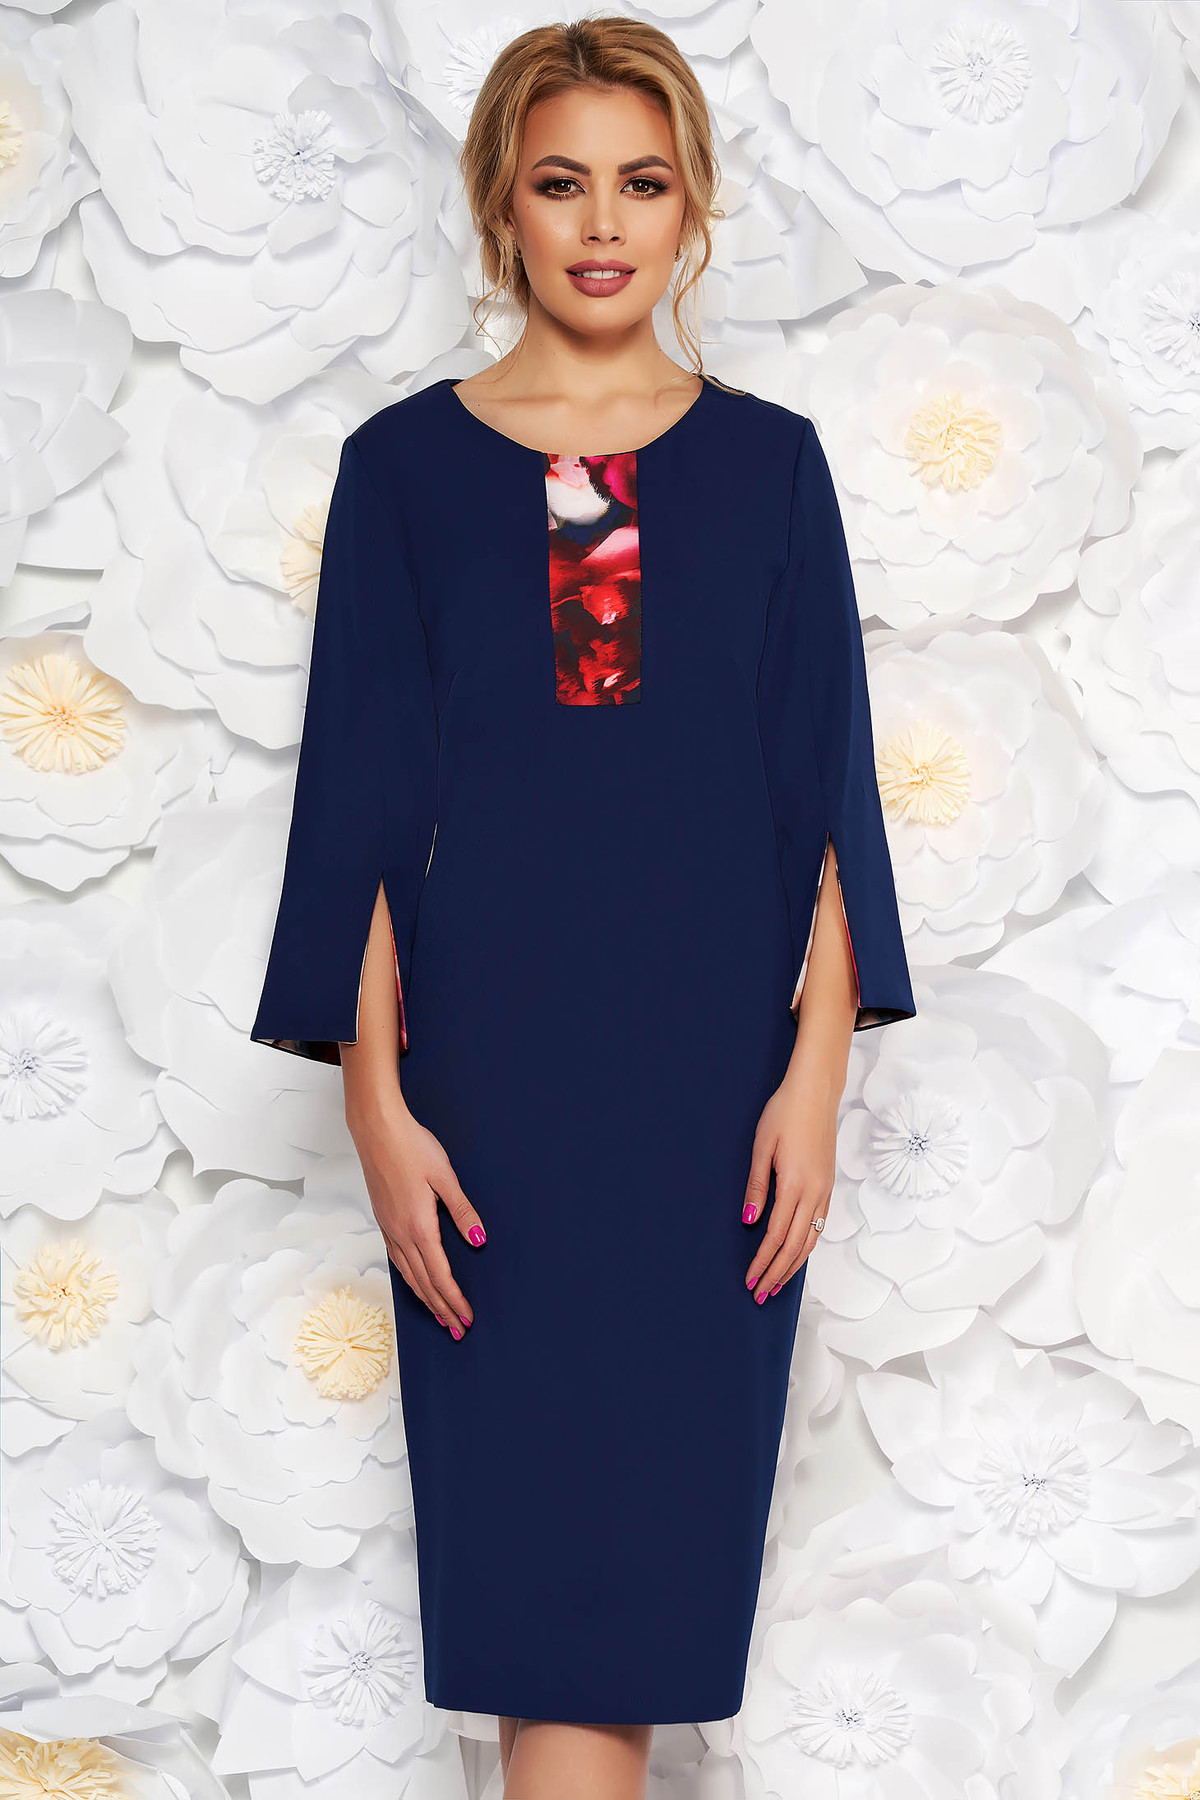 Rochie albastra-inchis eleganta tip creion cu maneca 3/4 din stofa subtire usor elastica